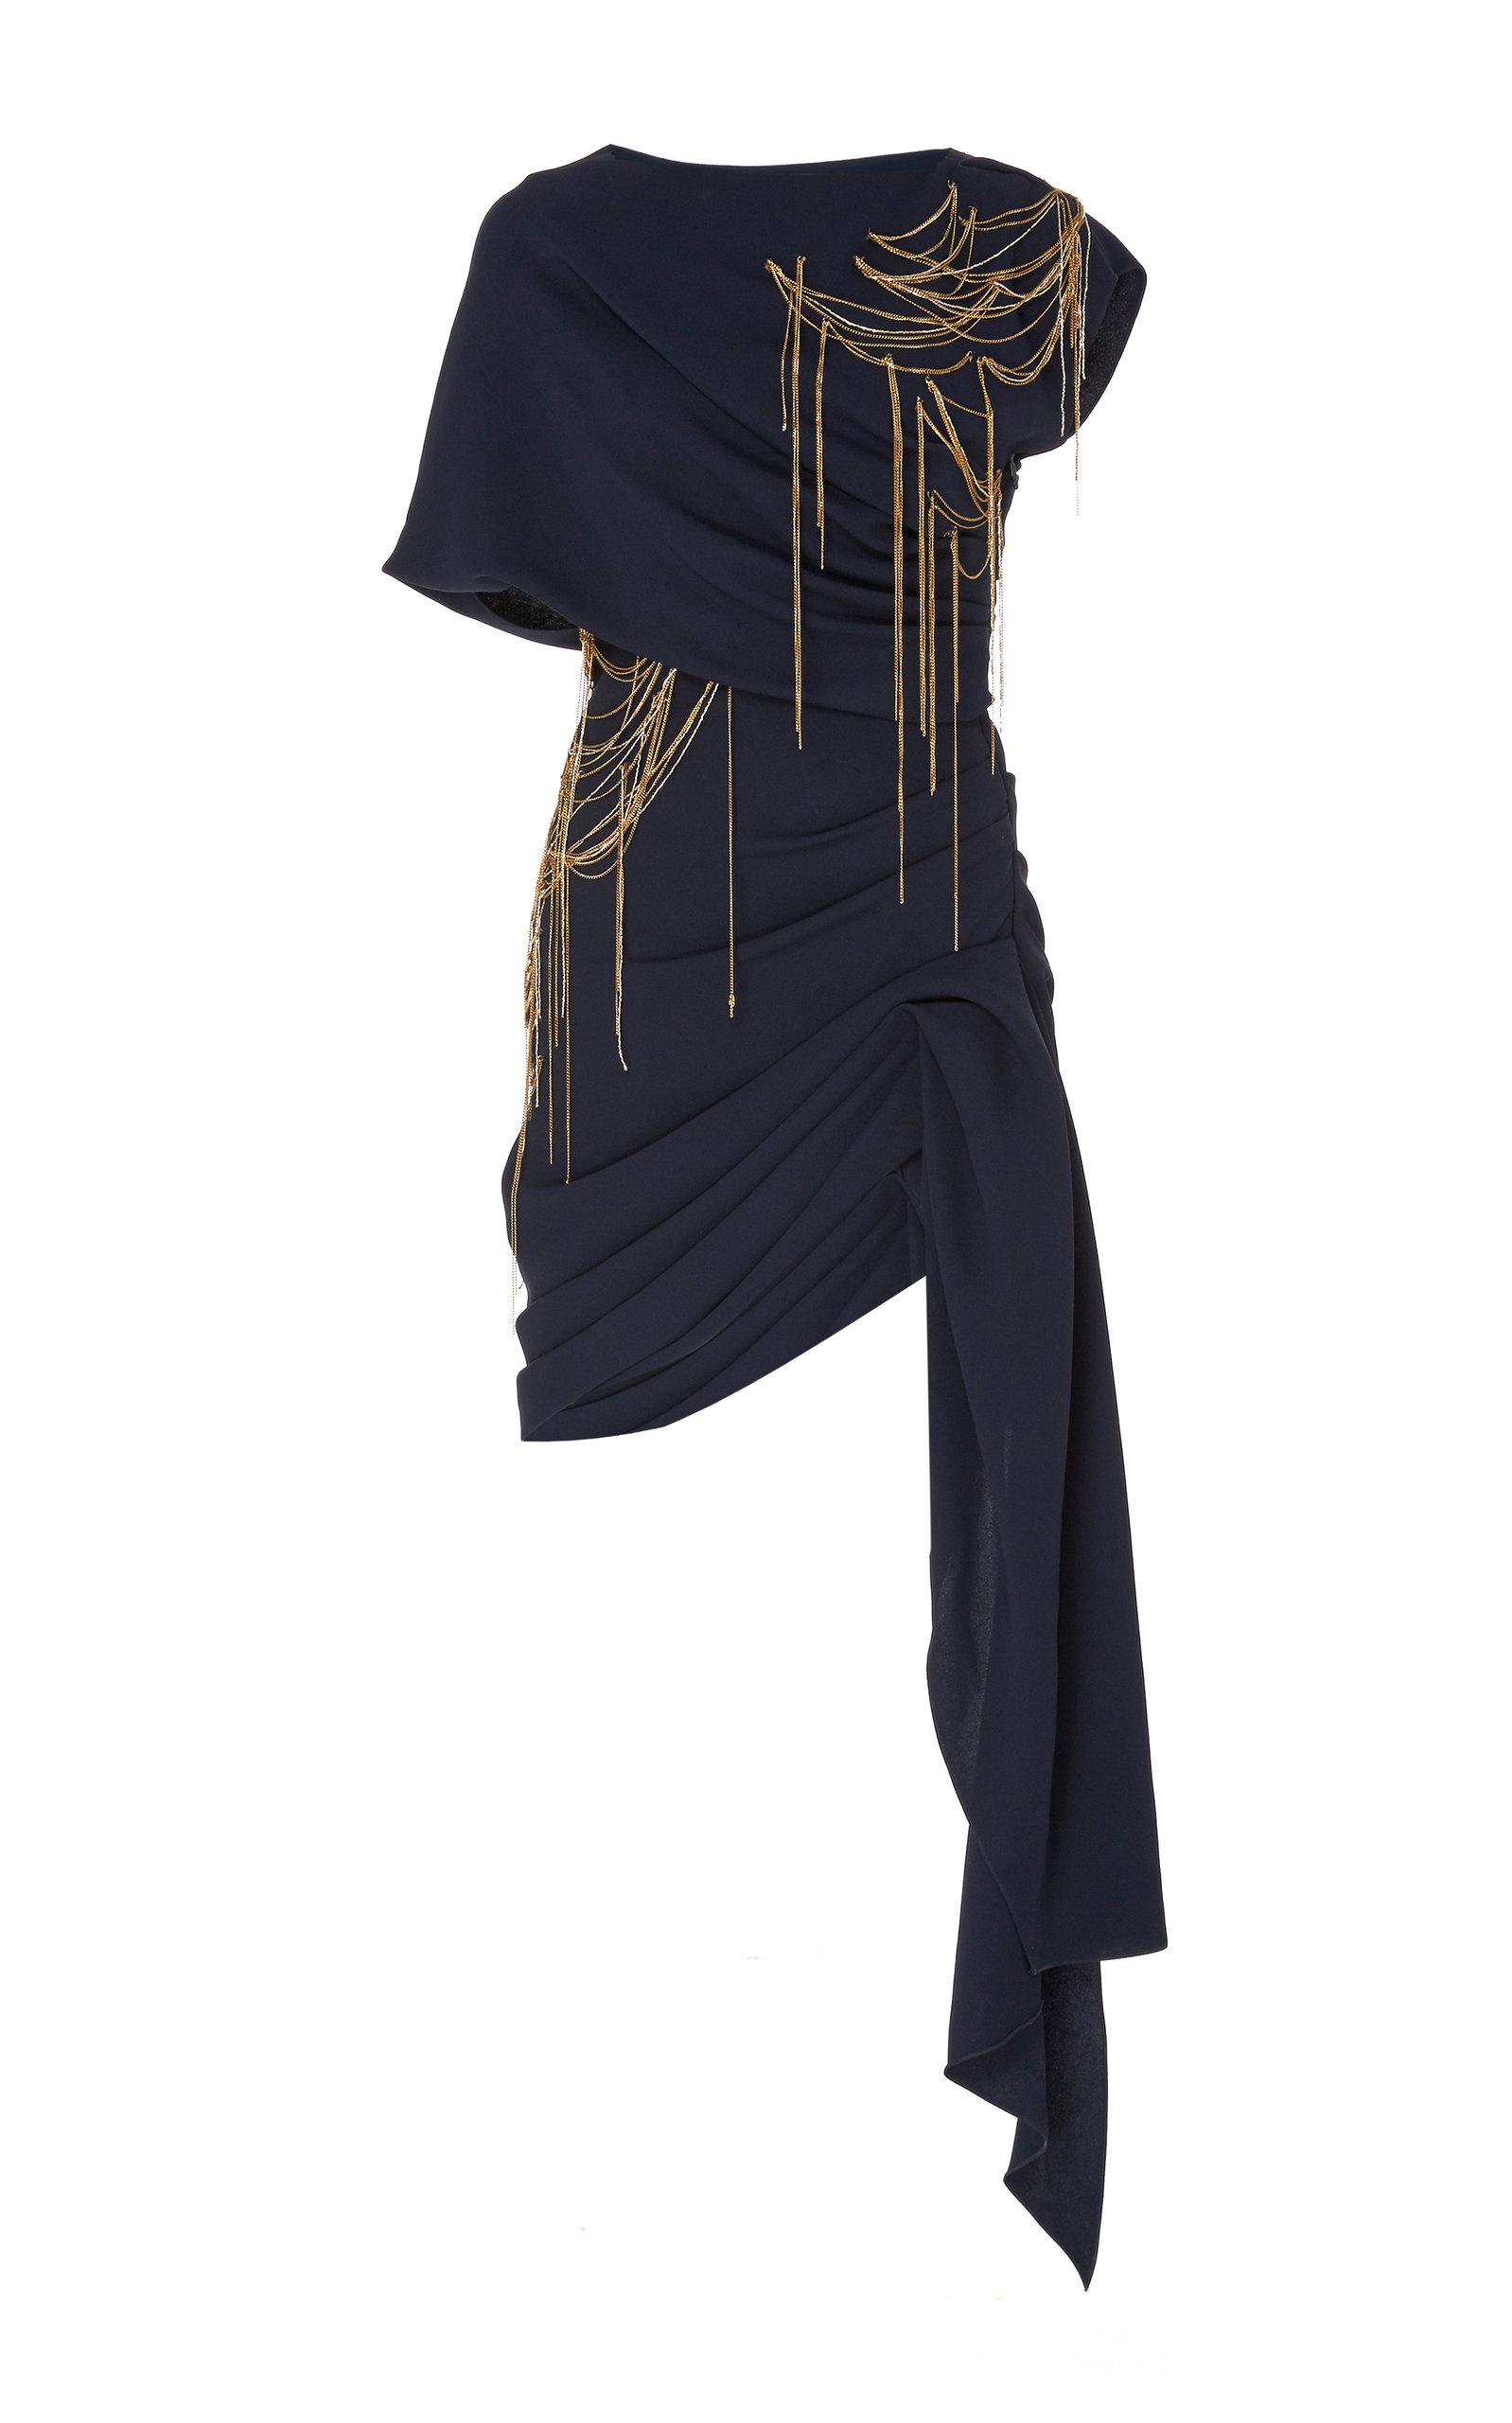 Buy Oscar de la Renta Embellished Draped Silk Mini Dress online, shop Oscar de la Renta at the best price